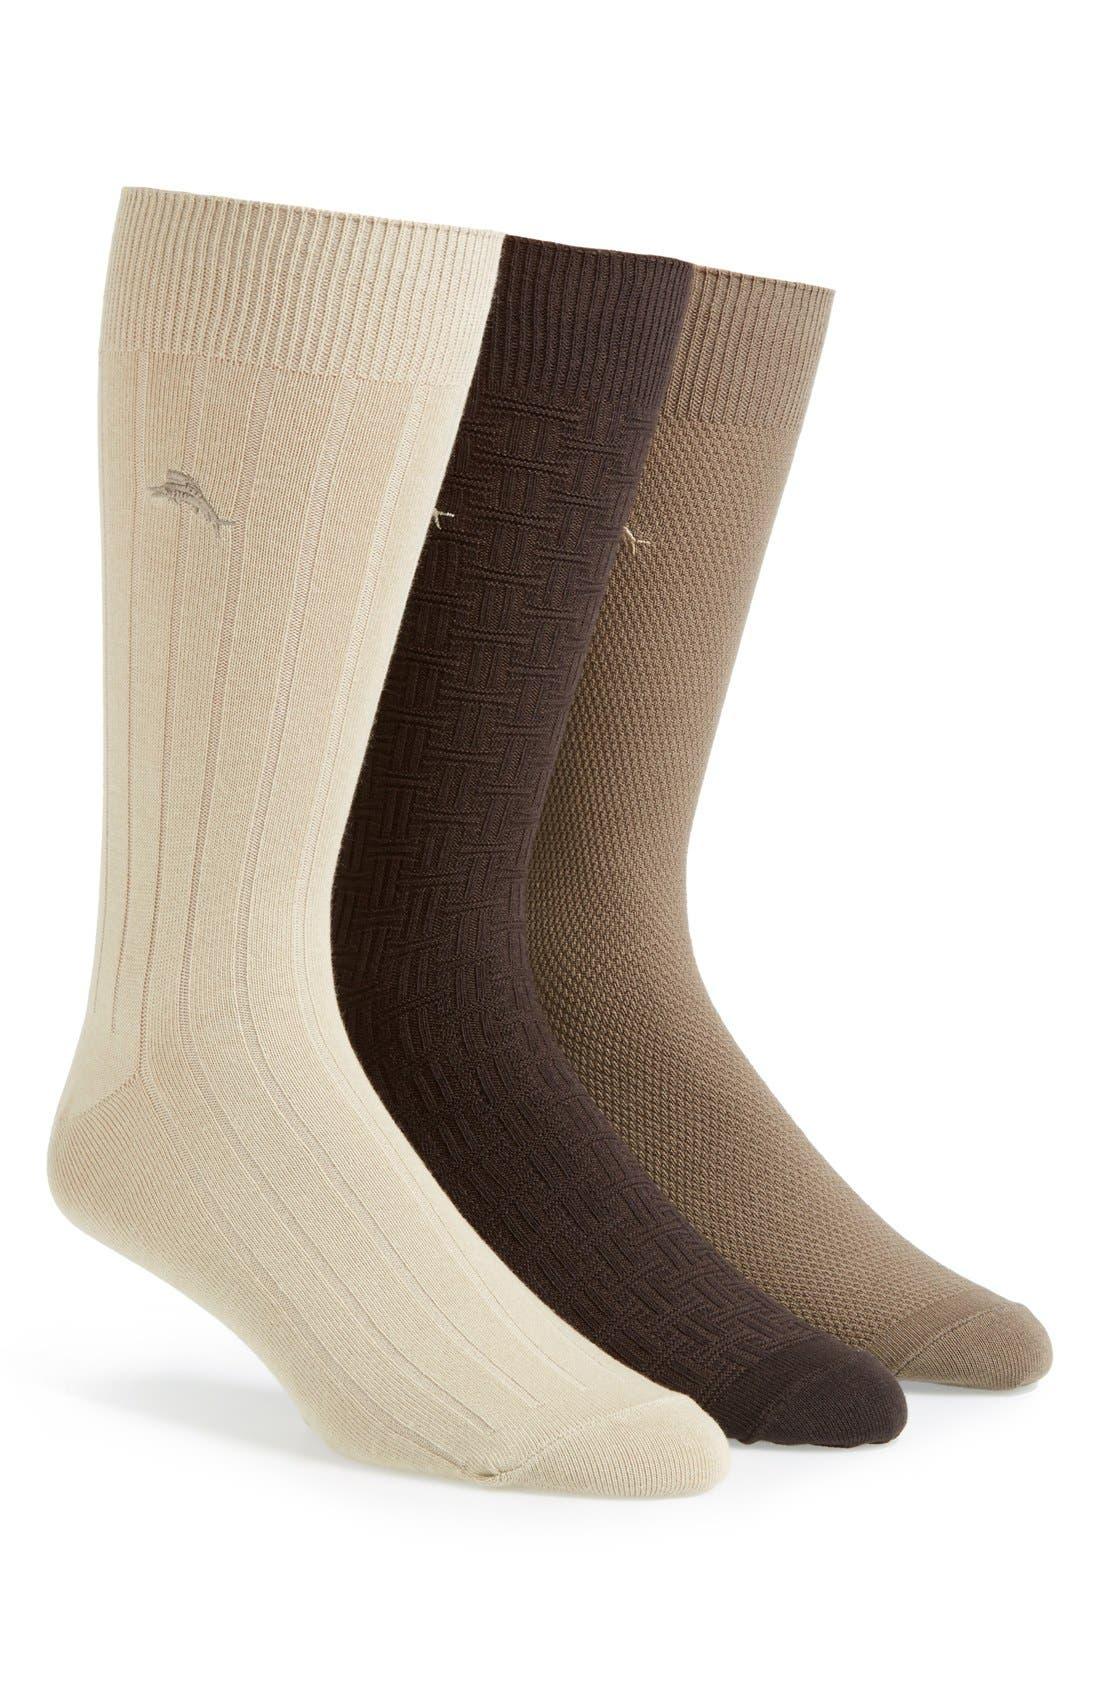 Cotton Blend Socks,                             Main thumbnail 1, color,                             250